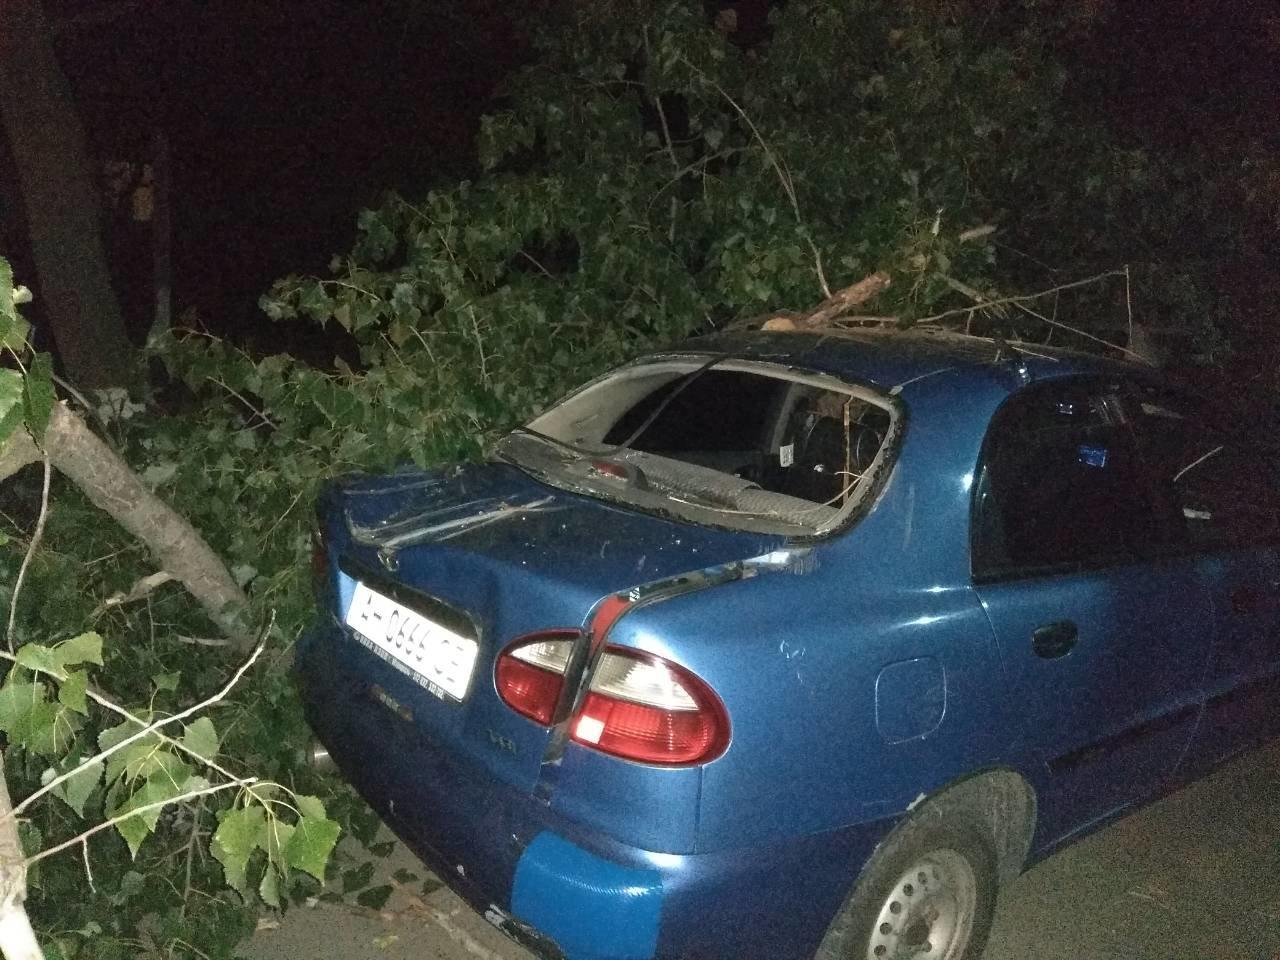 В Мариуполе на автомобиль упало дерево, - ФОТО, фото-2